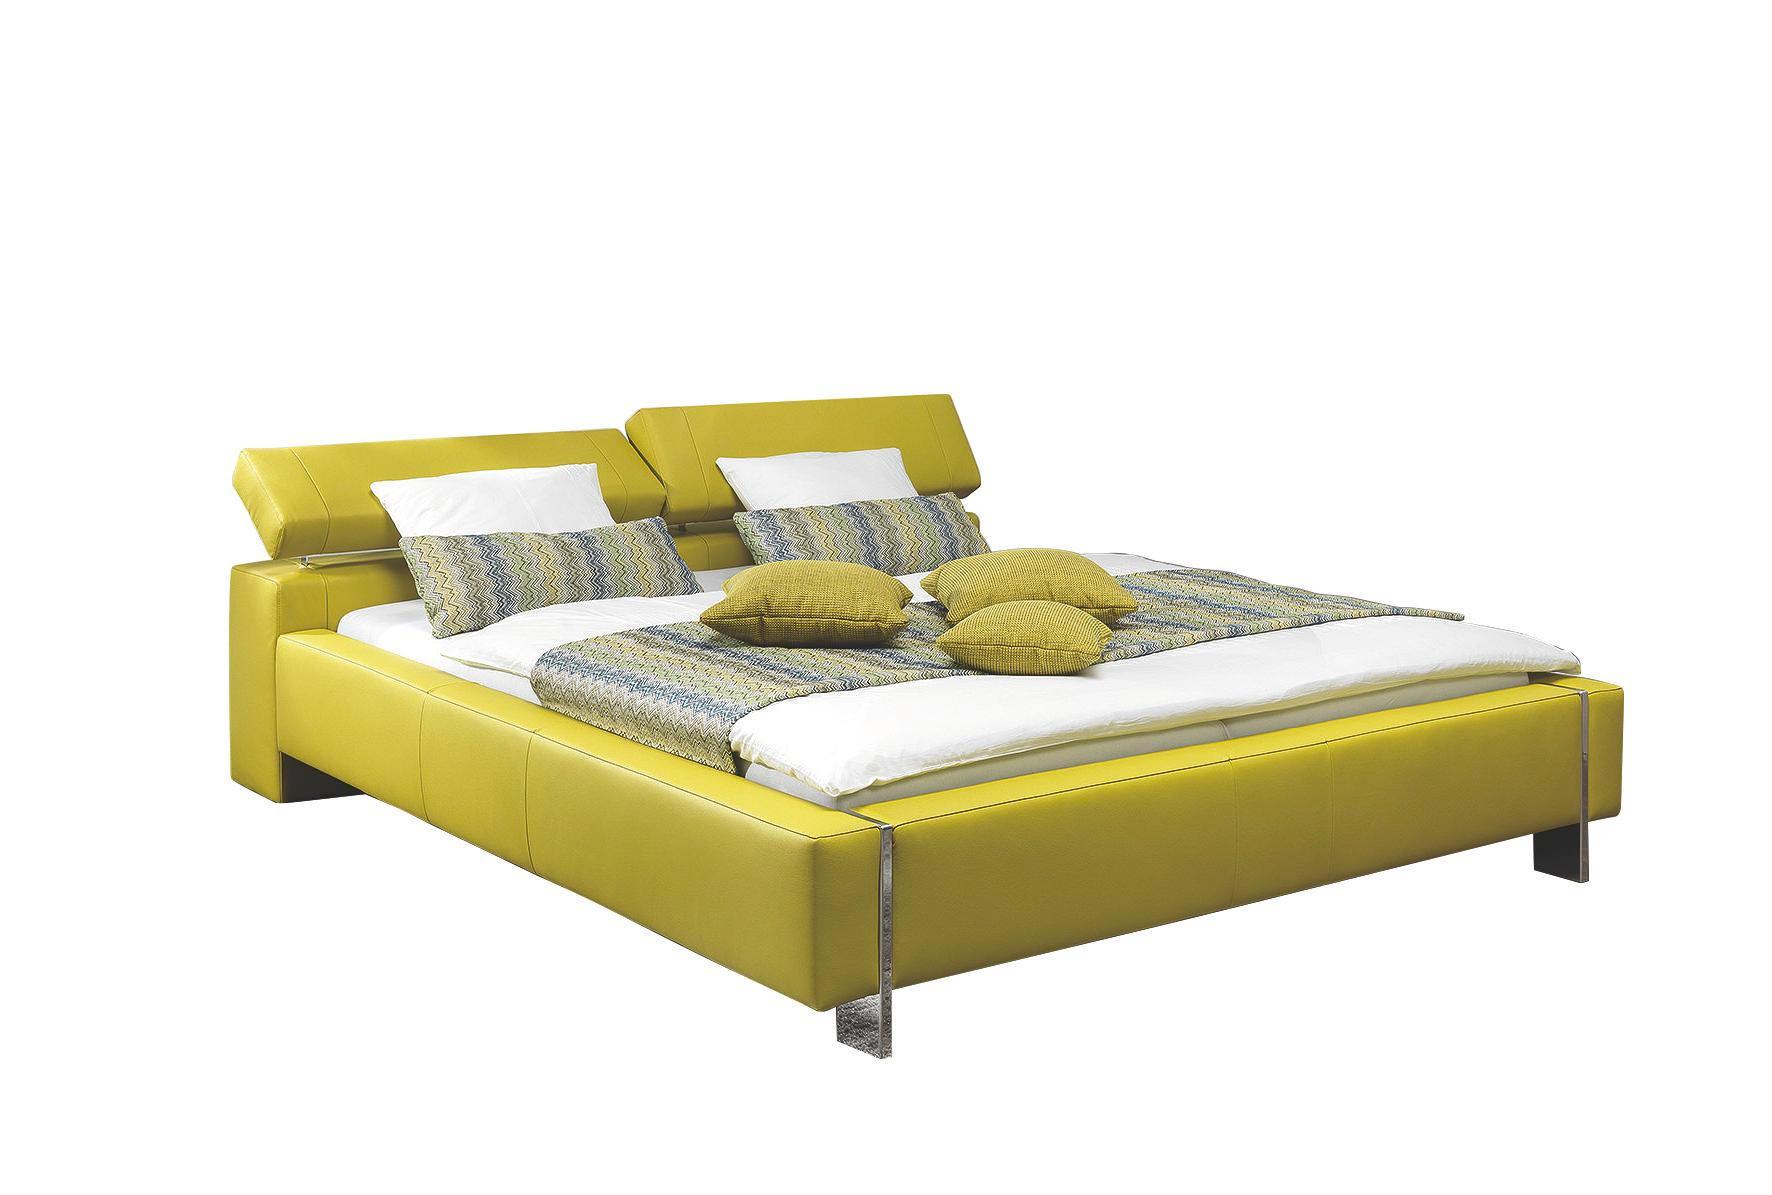 BETT 180/200 cm - Gelb/Alufarben, Design, Leder/Metall (180/200cm) - XORA